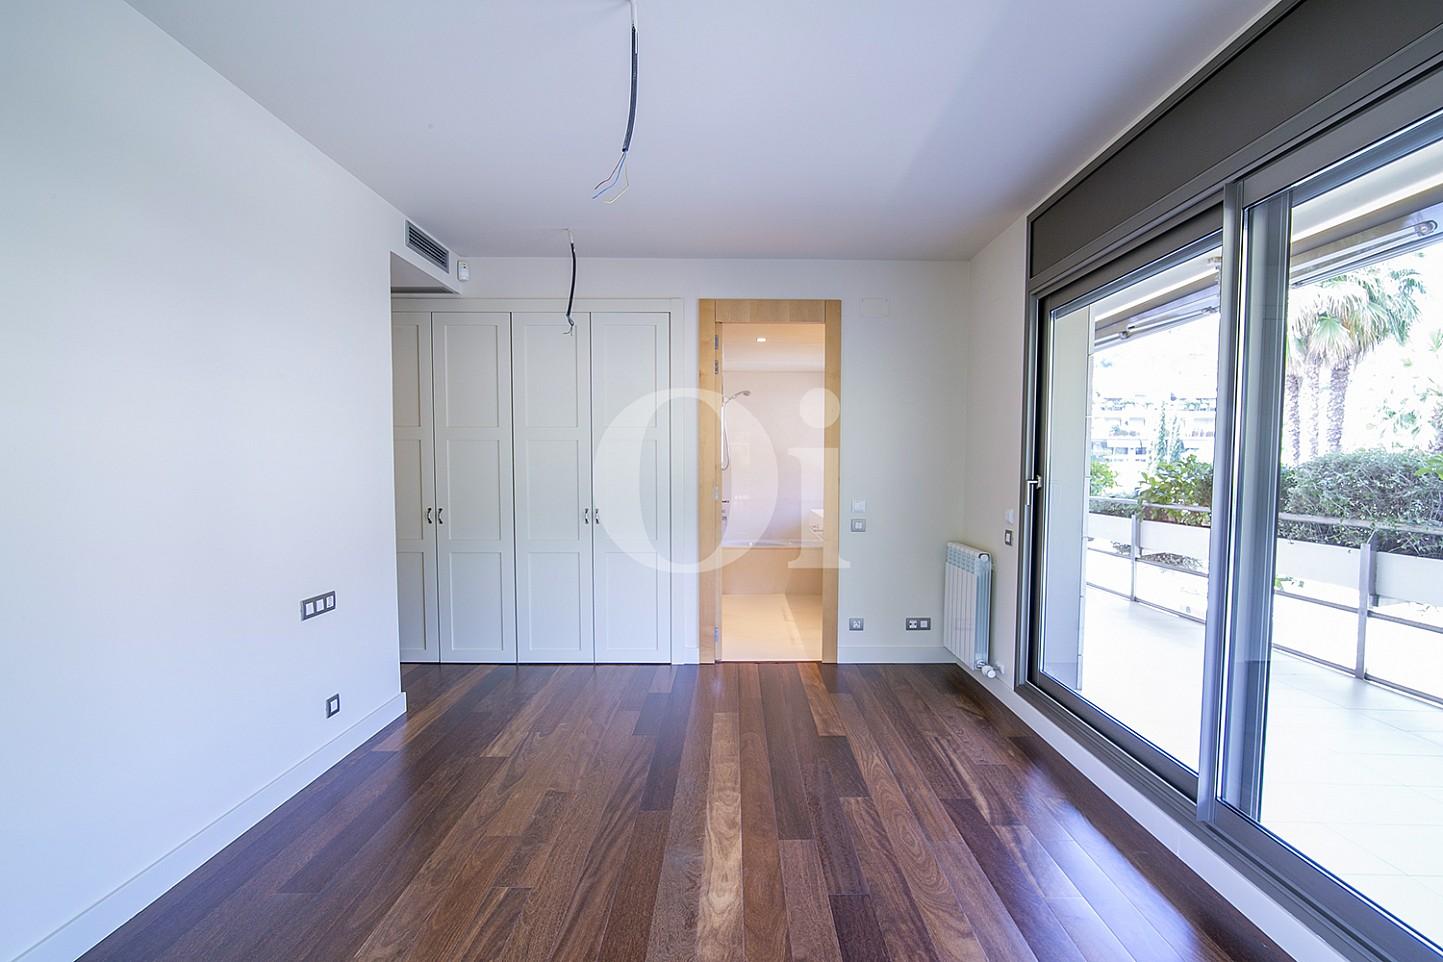 Шикарная квартира на продажу в районе Torre Vilana, Barcelona